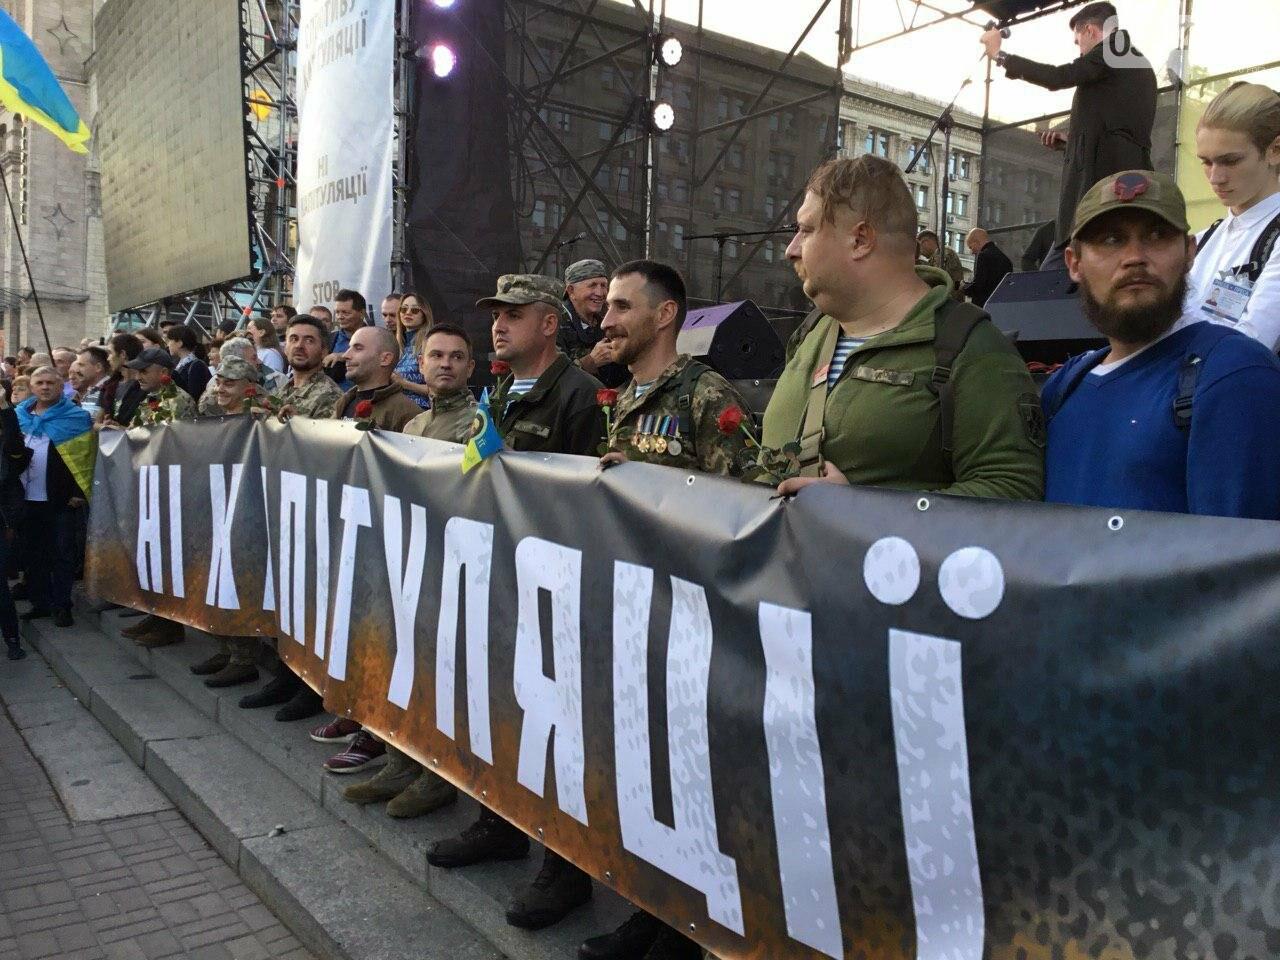 Криворожане поддержали Марш сопротивления капитуляции в Киеве, - ФОТО, ВИДЕО, ОБНОВЛЕНО, фото-39